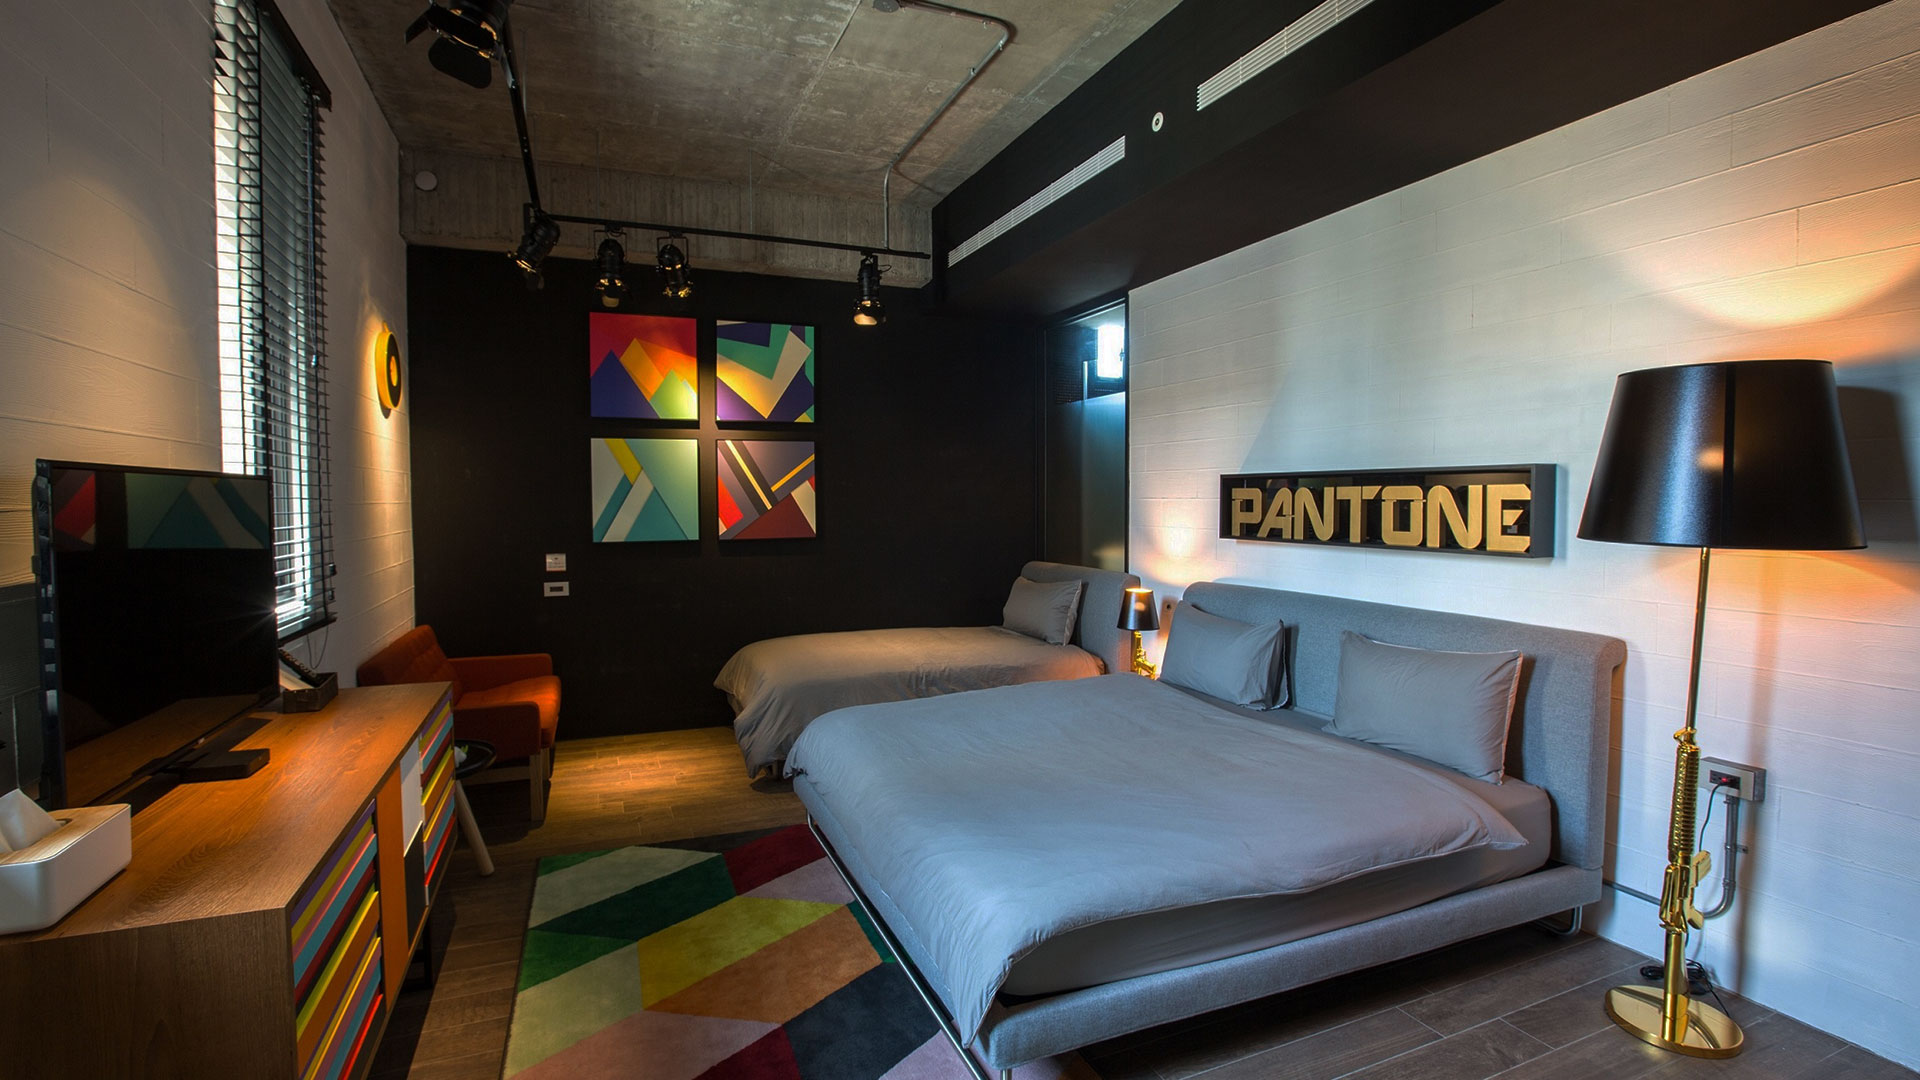 Pantone 色調